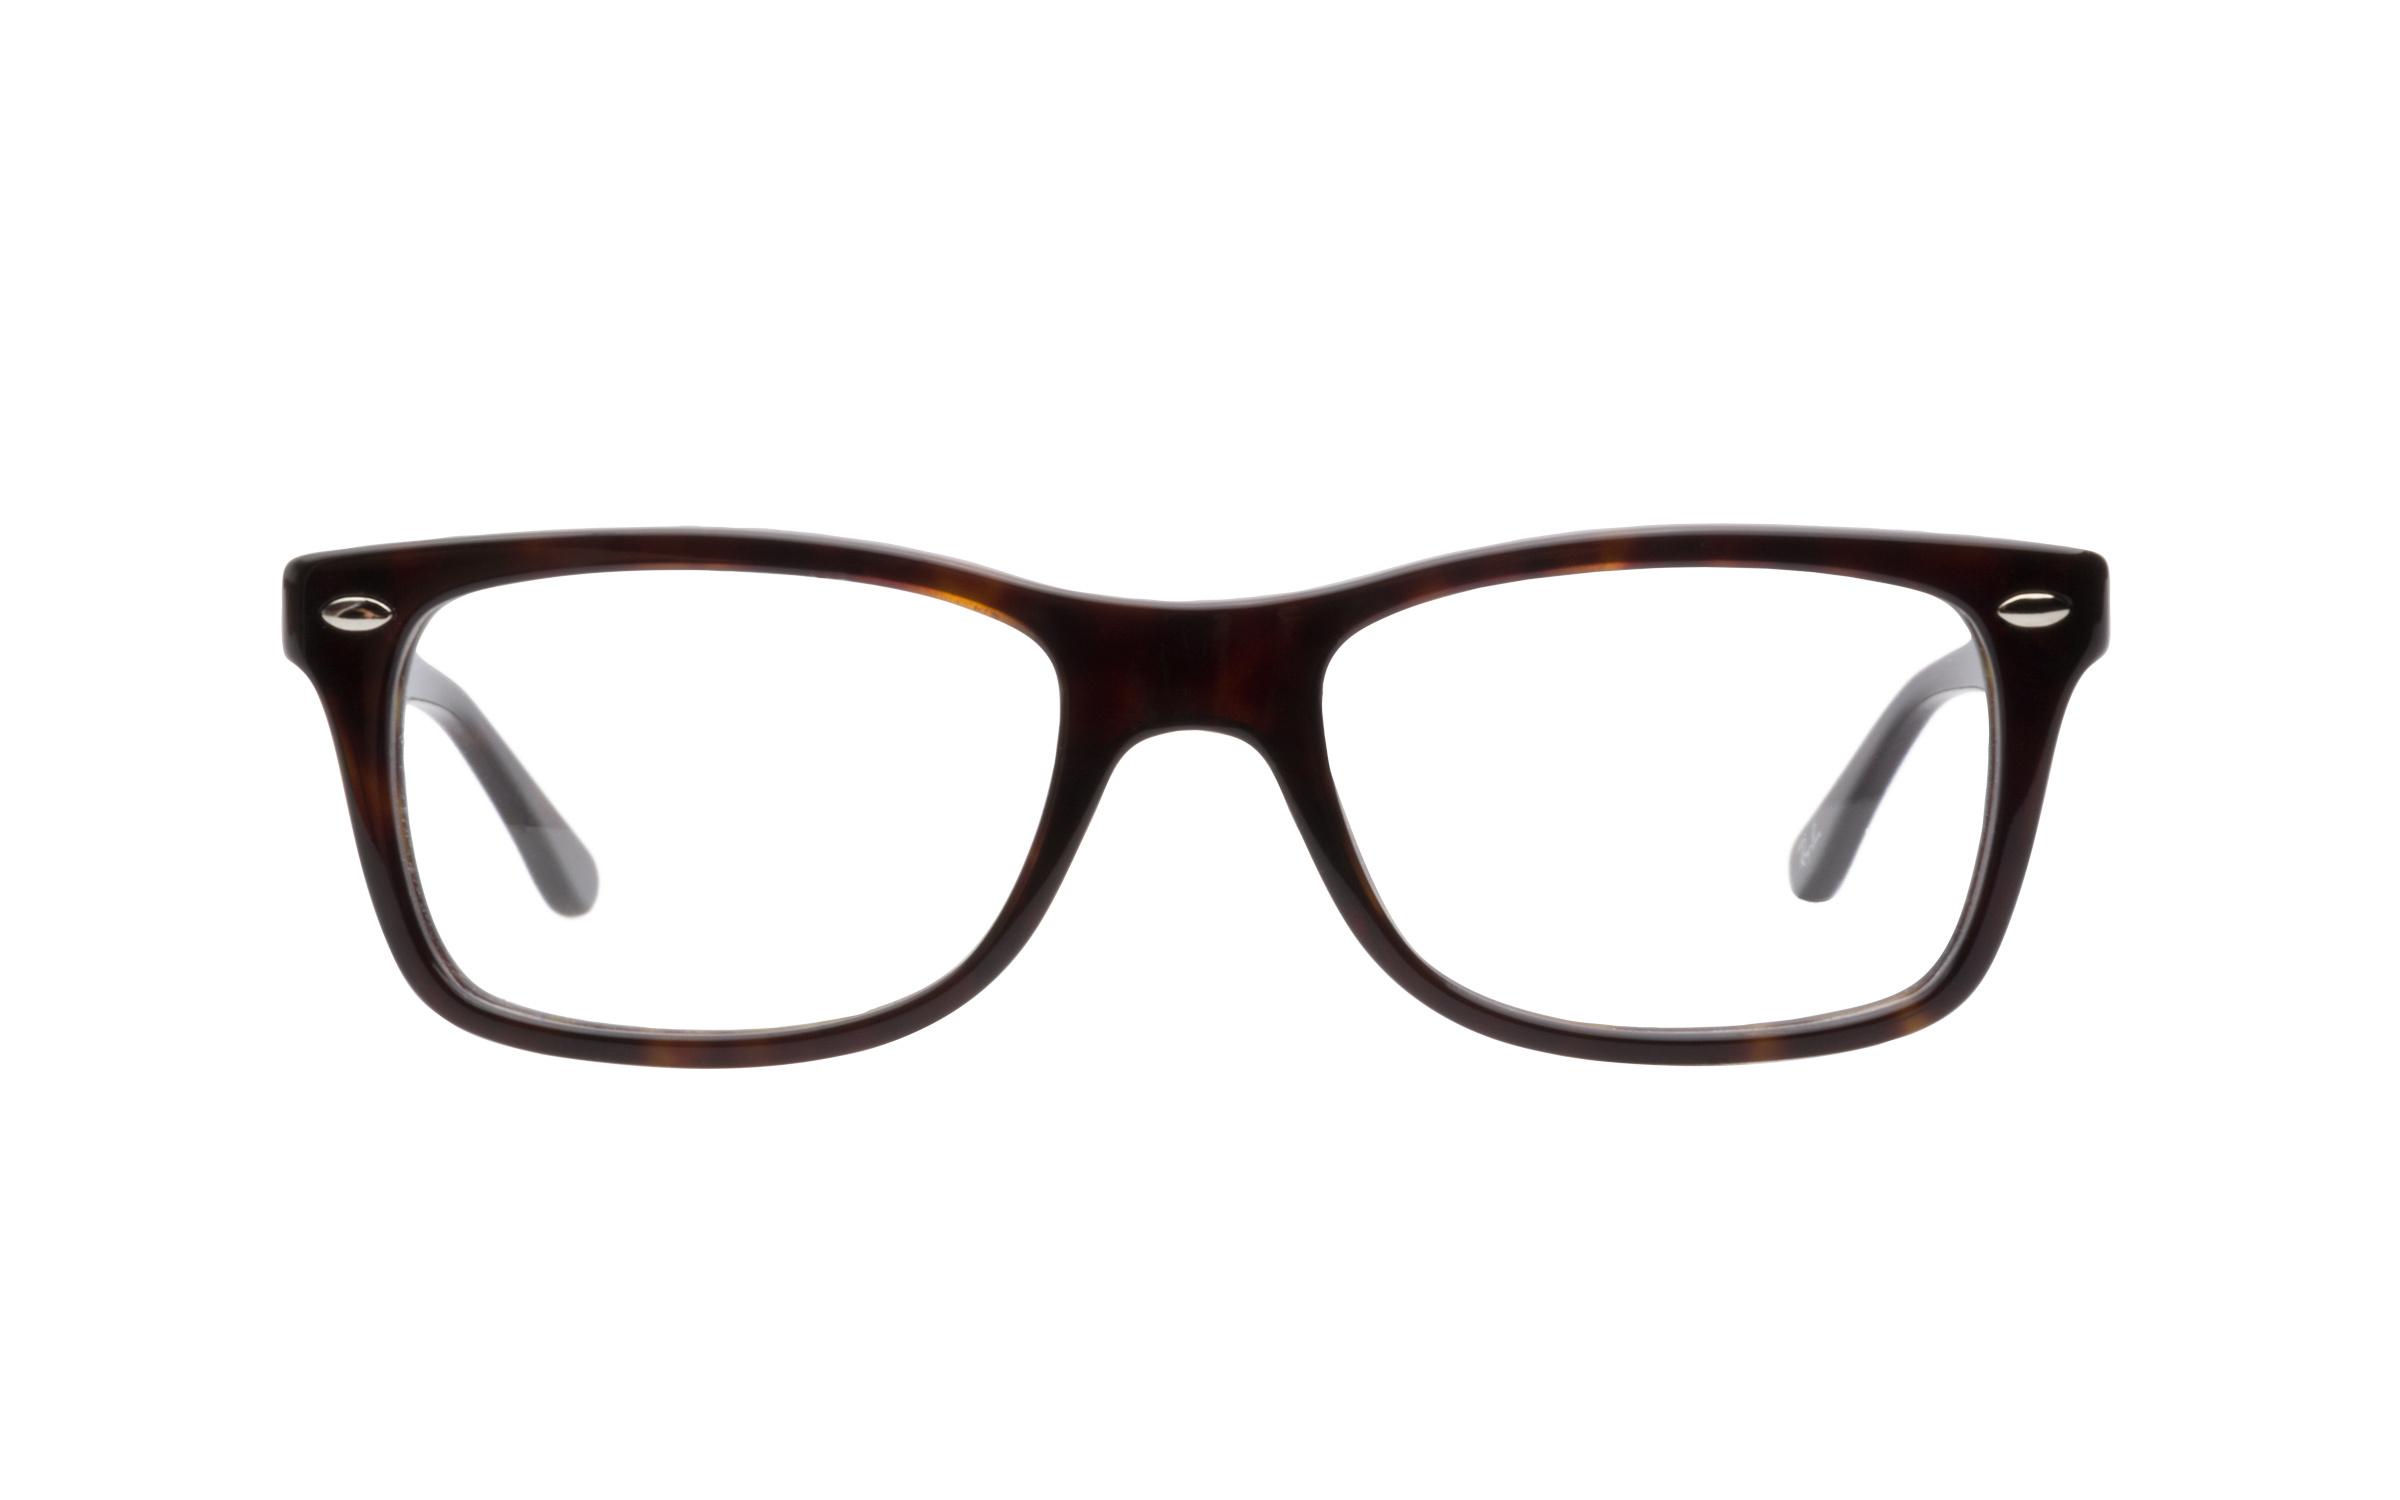 http://www.coastal.com/ - Luxottica Ray-Ban RB5228 2012 50 Eyeglasses and Frame in Dark Havana Tortoise | Acetate – Online Coastal